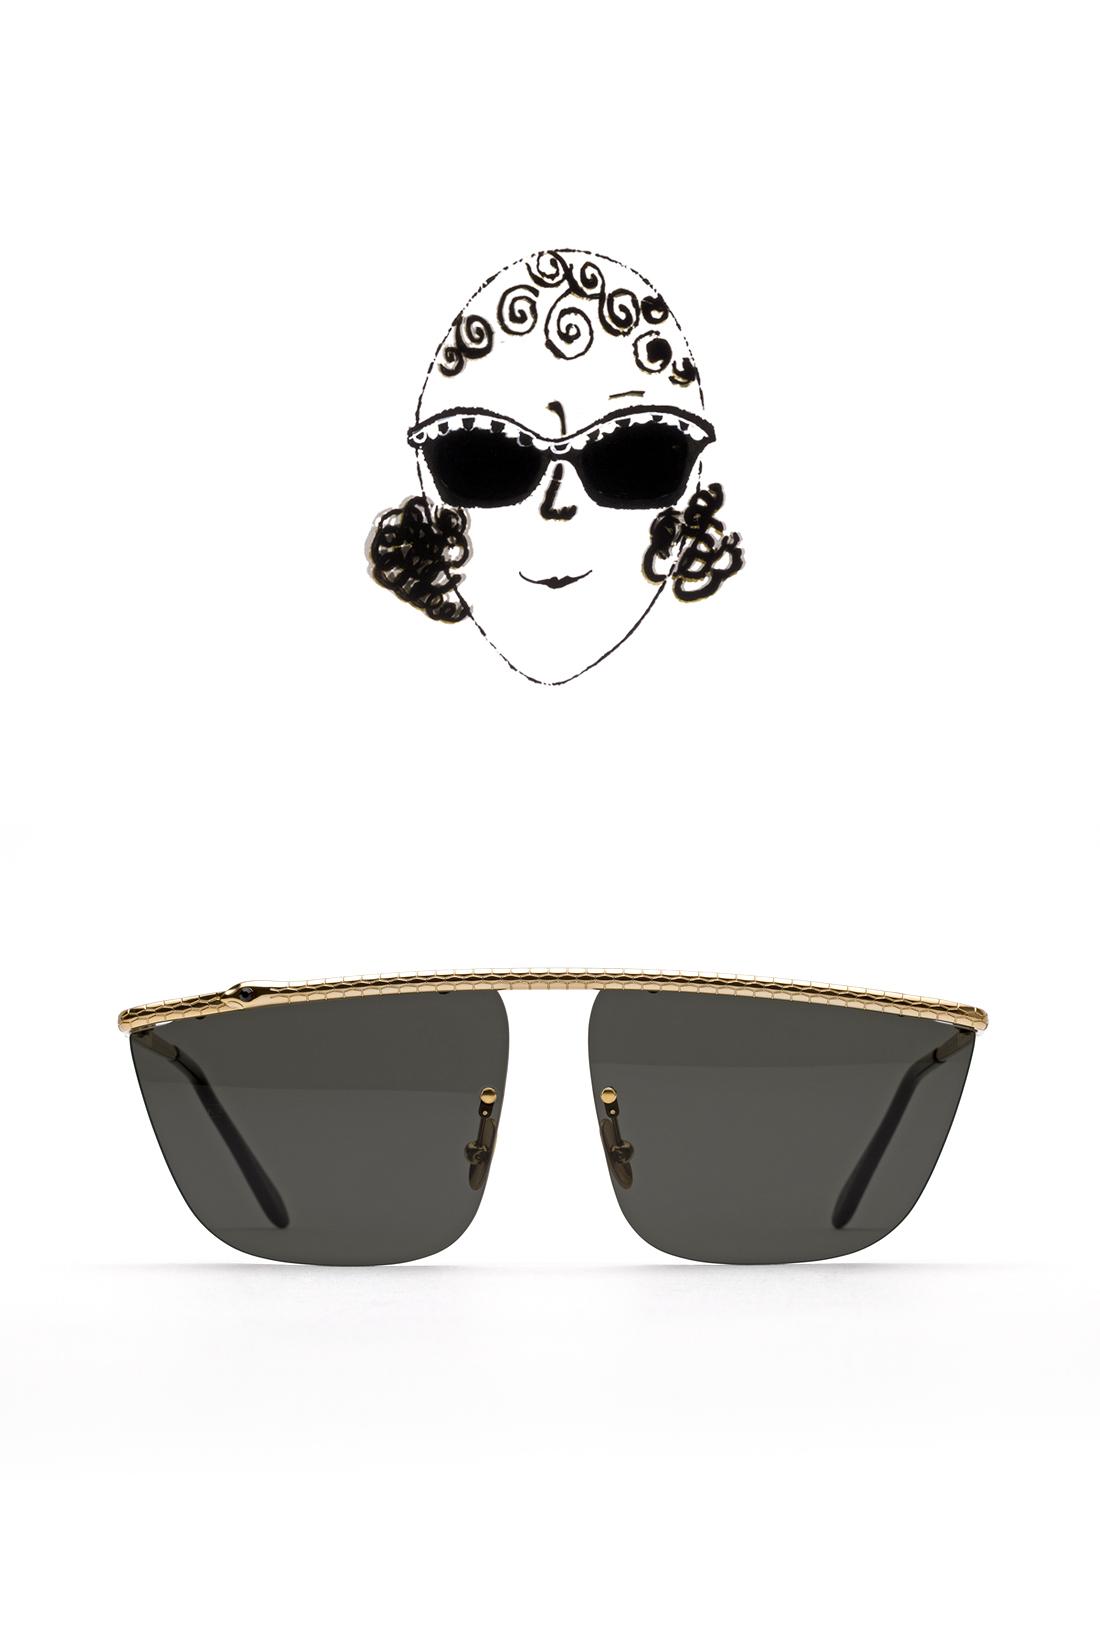 andy-warhol-retrosuperfuture-sunglasses-04